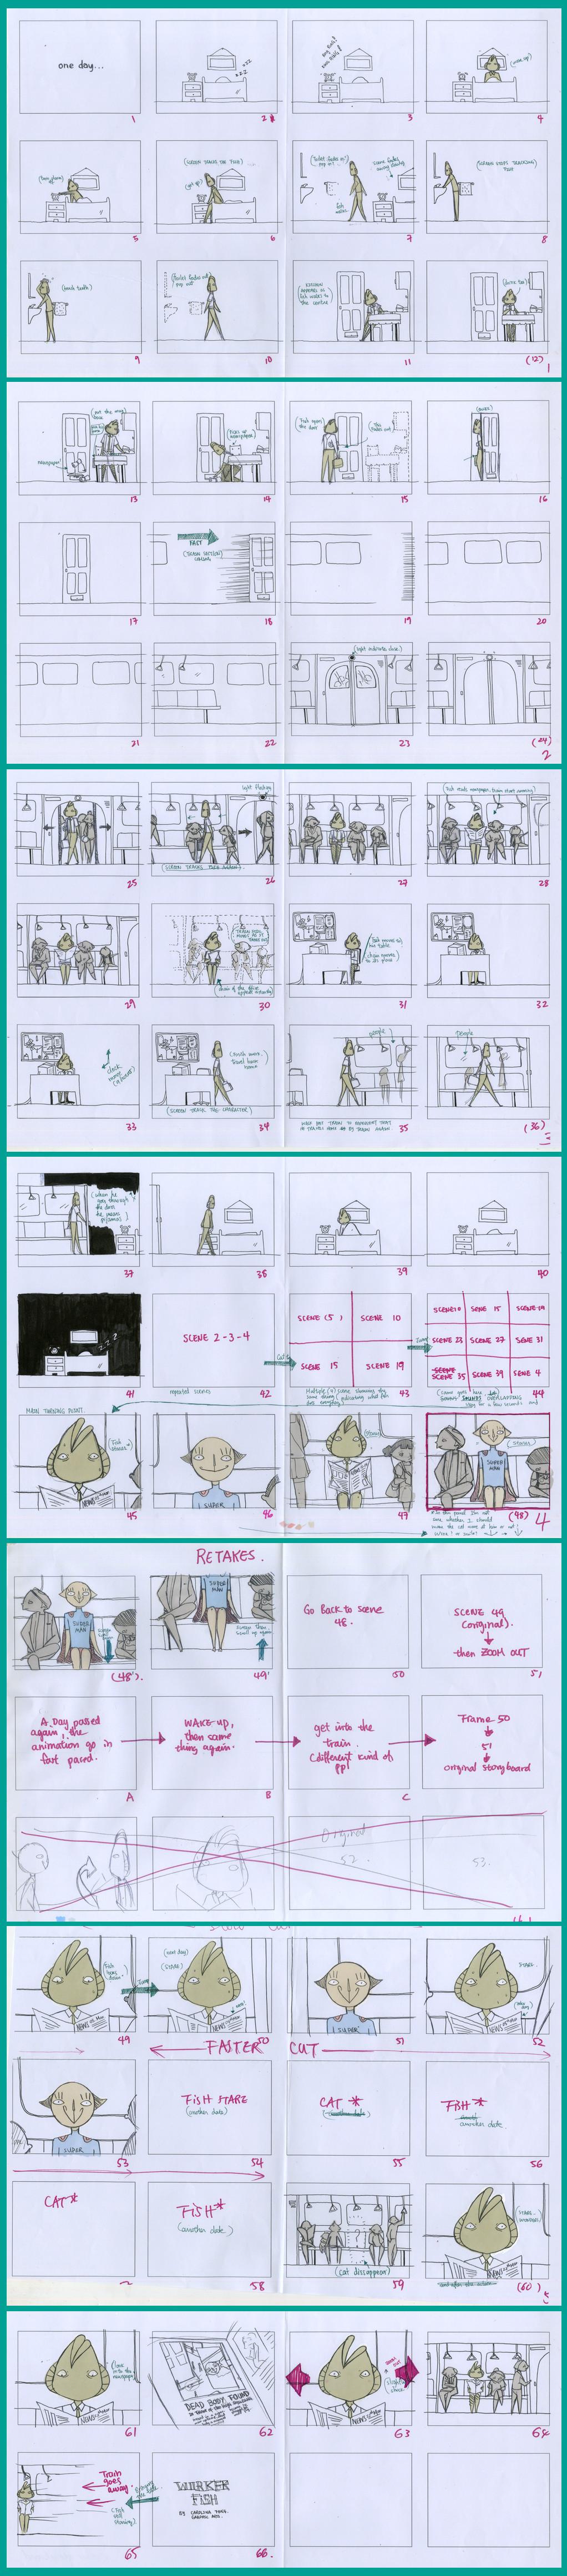 worker fish storyboard a3 by karolinamixiao on deviantart